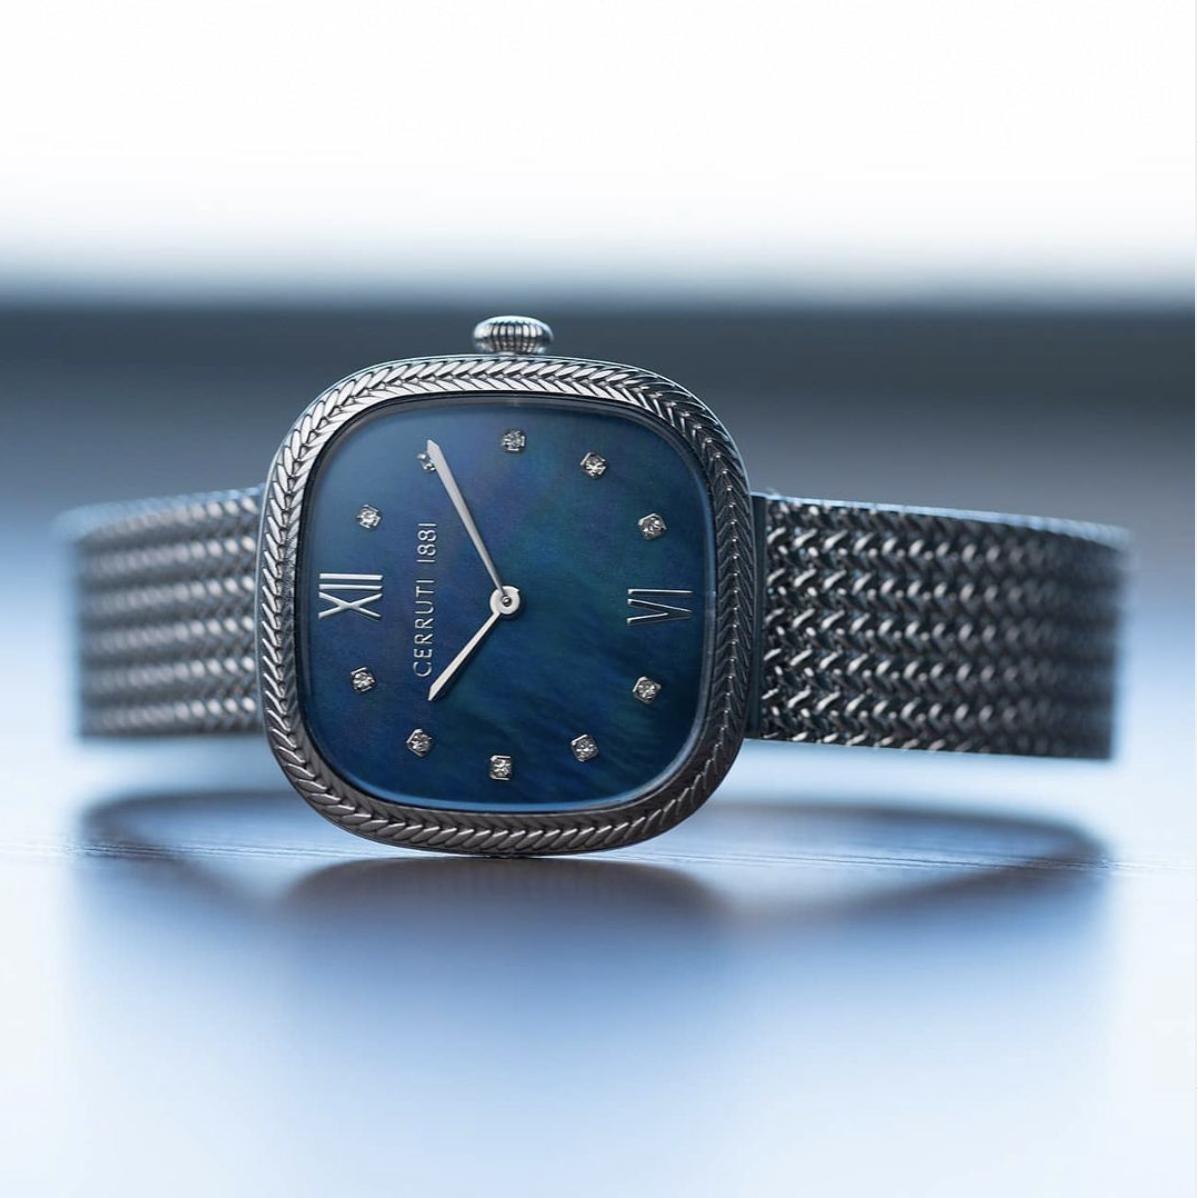 watch design rodolphedesign montre acier cadran bleu gent steel